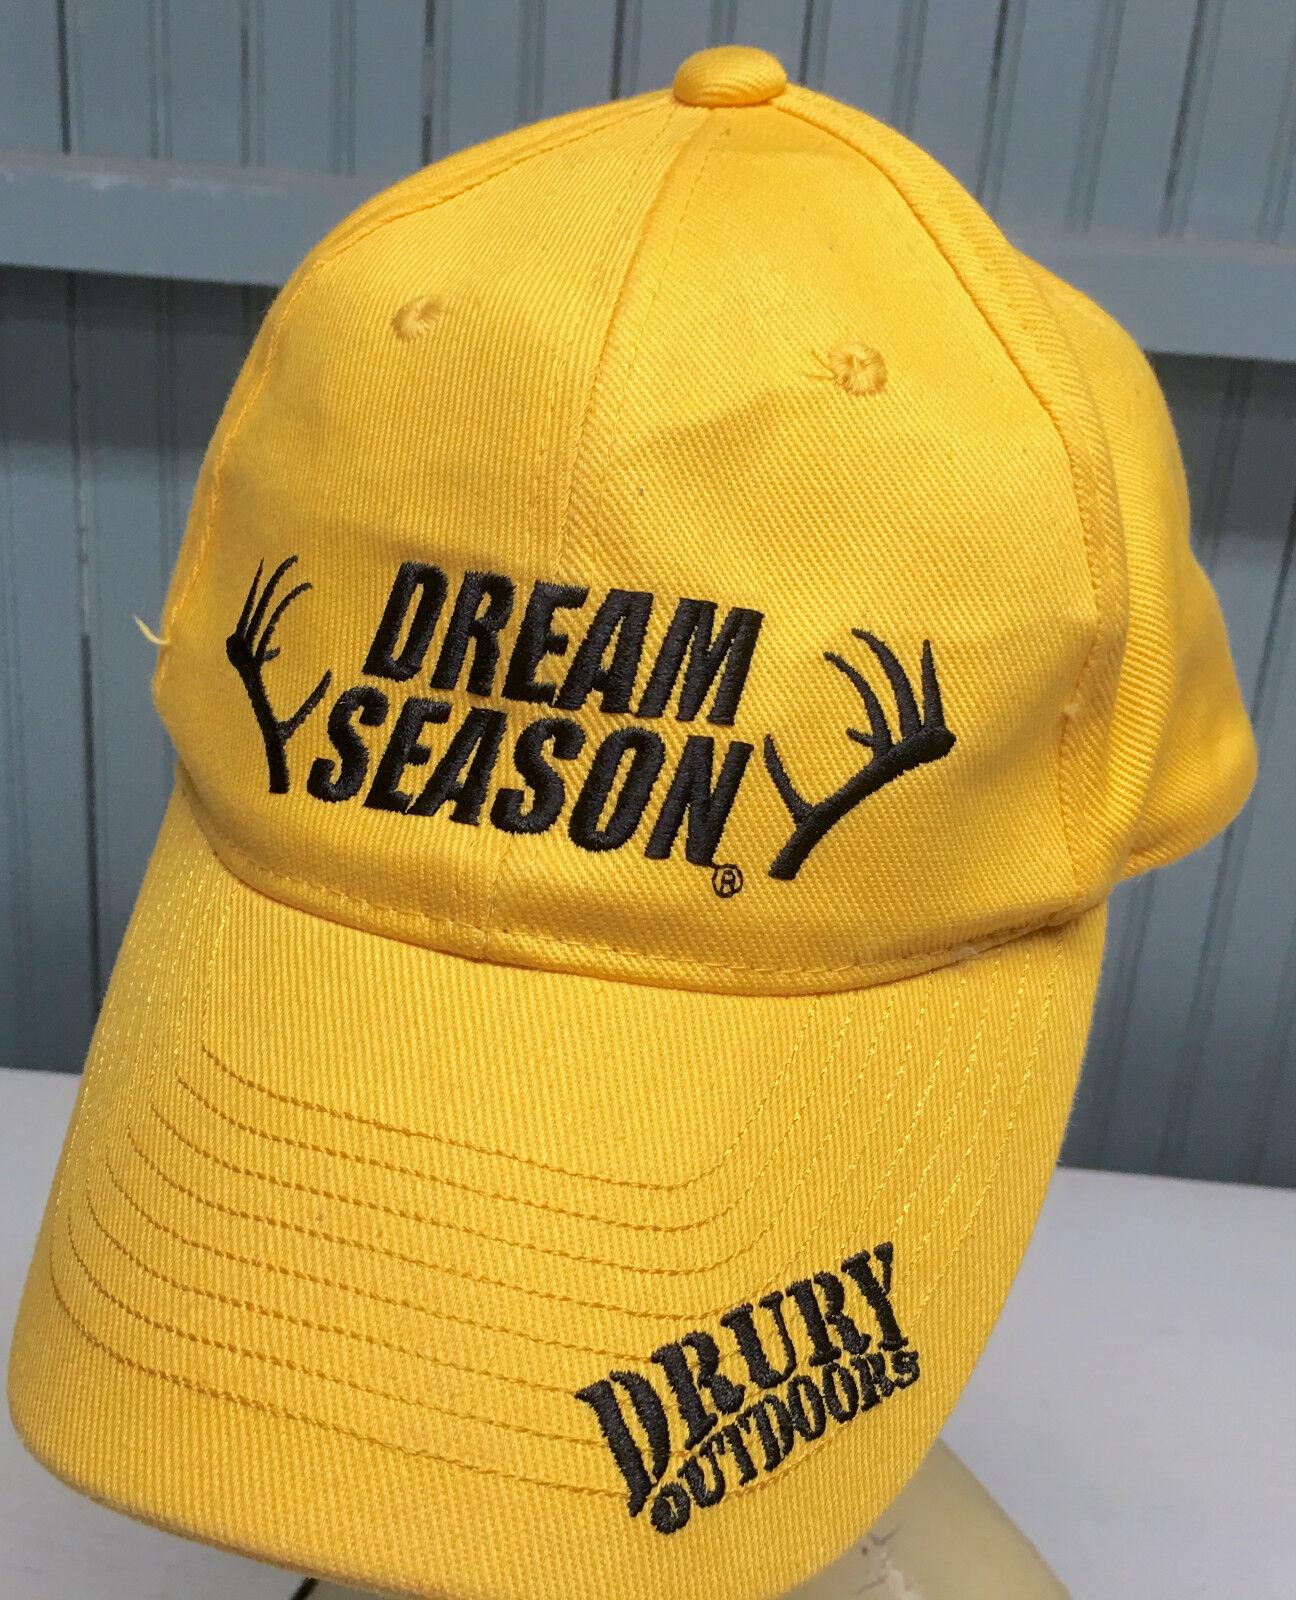 Drury Outdoors Dream Season Hunting Yelloe Strapback Baseball Cap Cap Baseball Hat 1caa9d